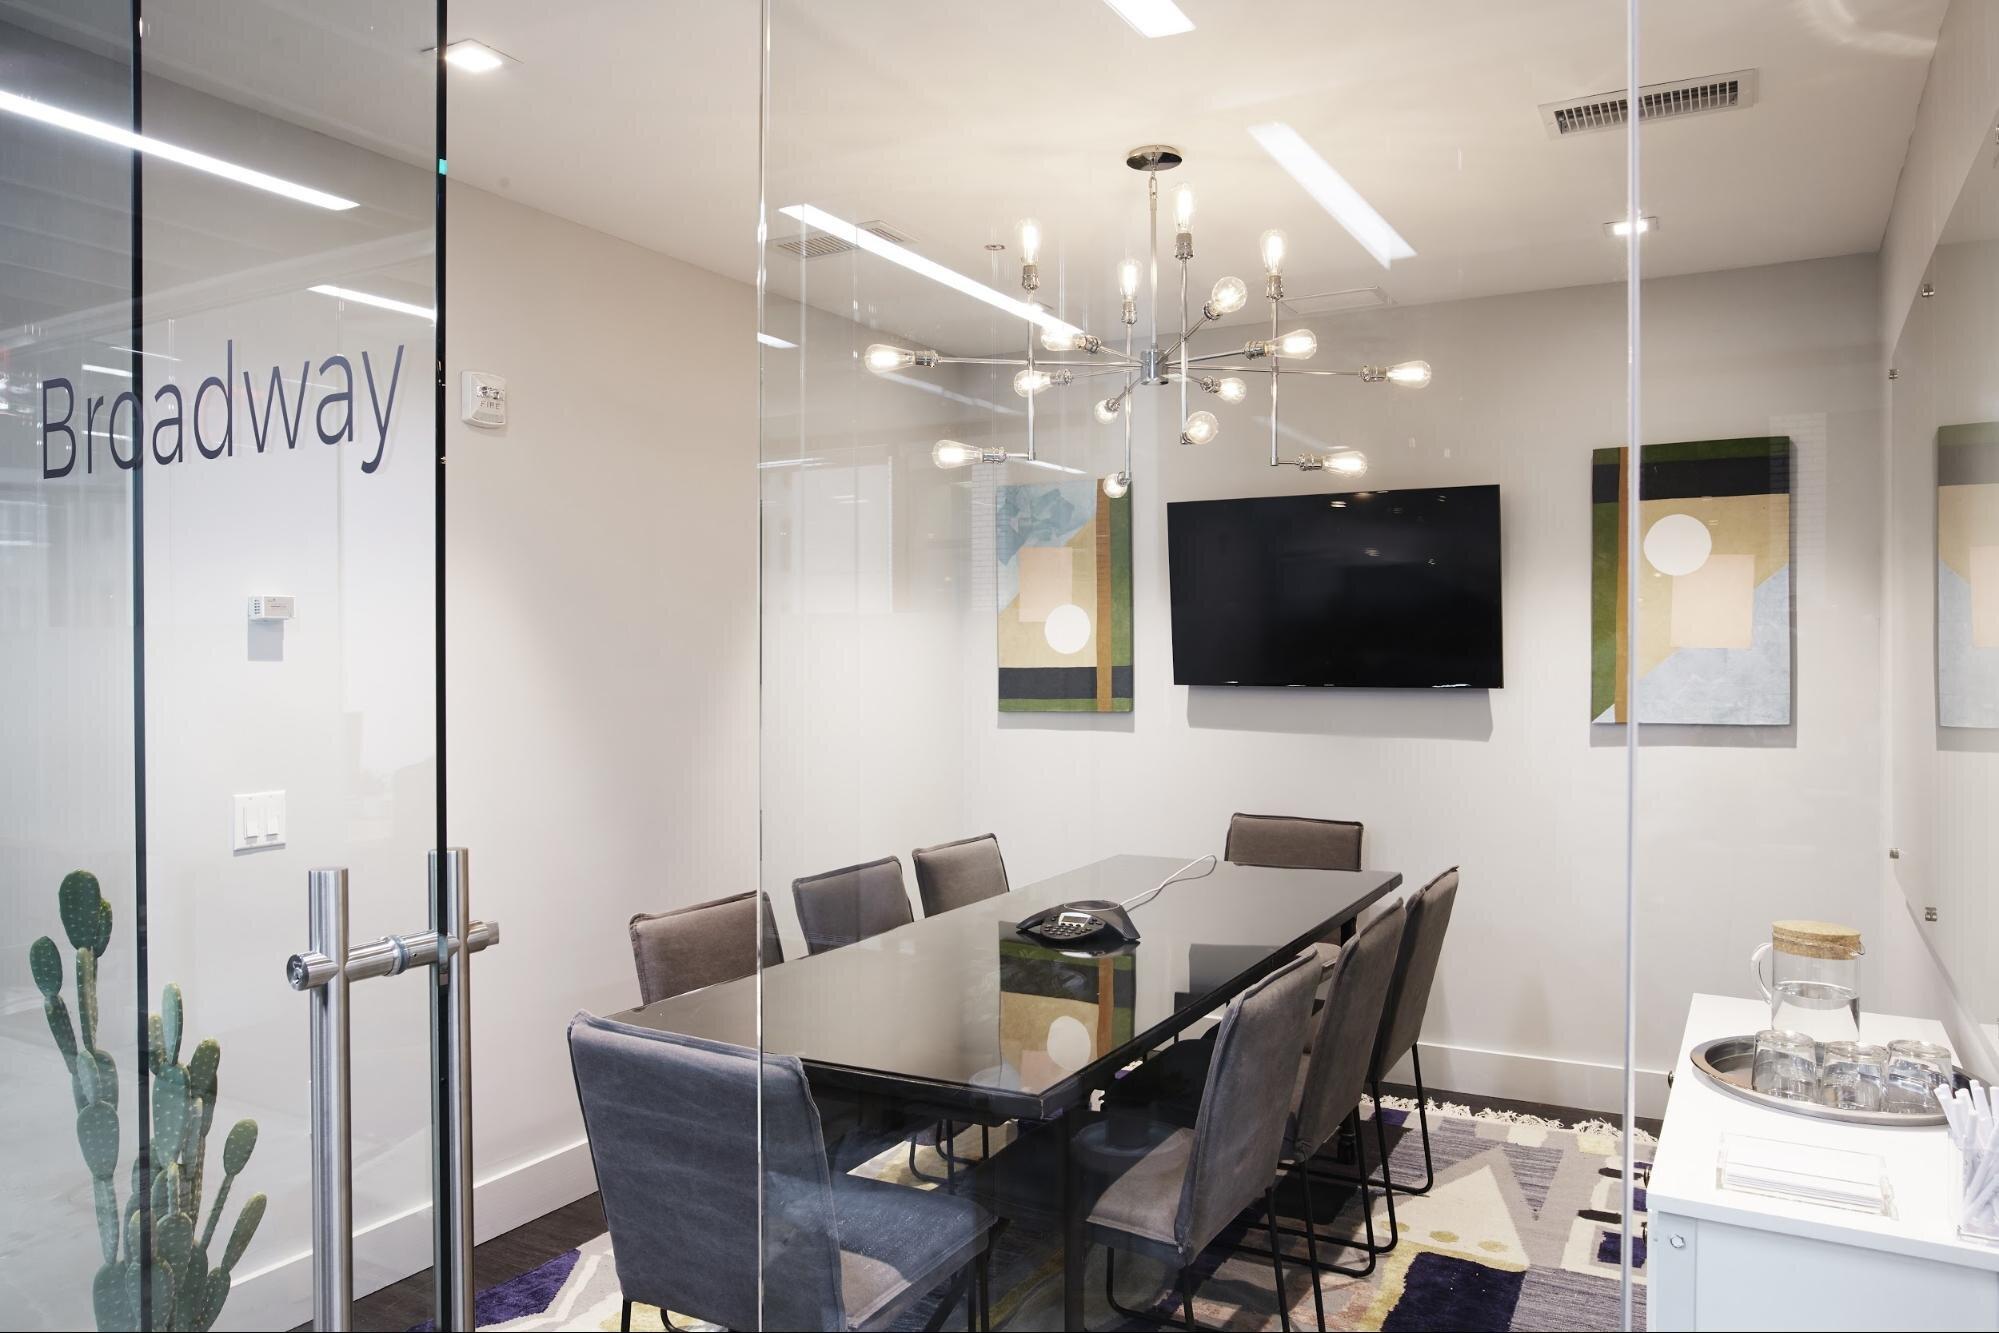 Office meeting space